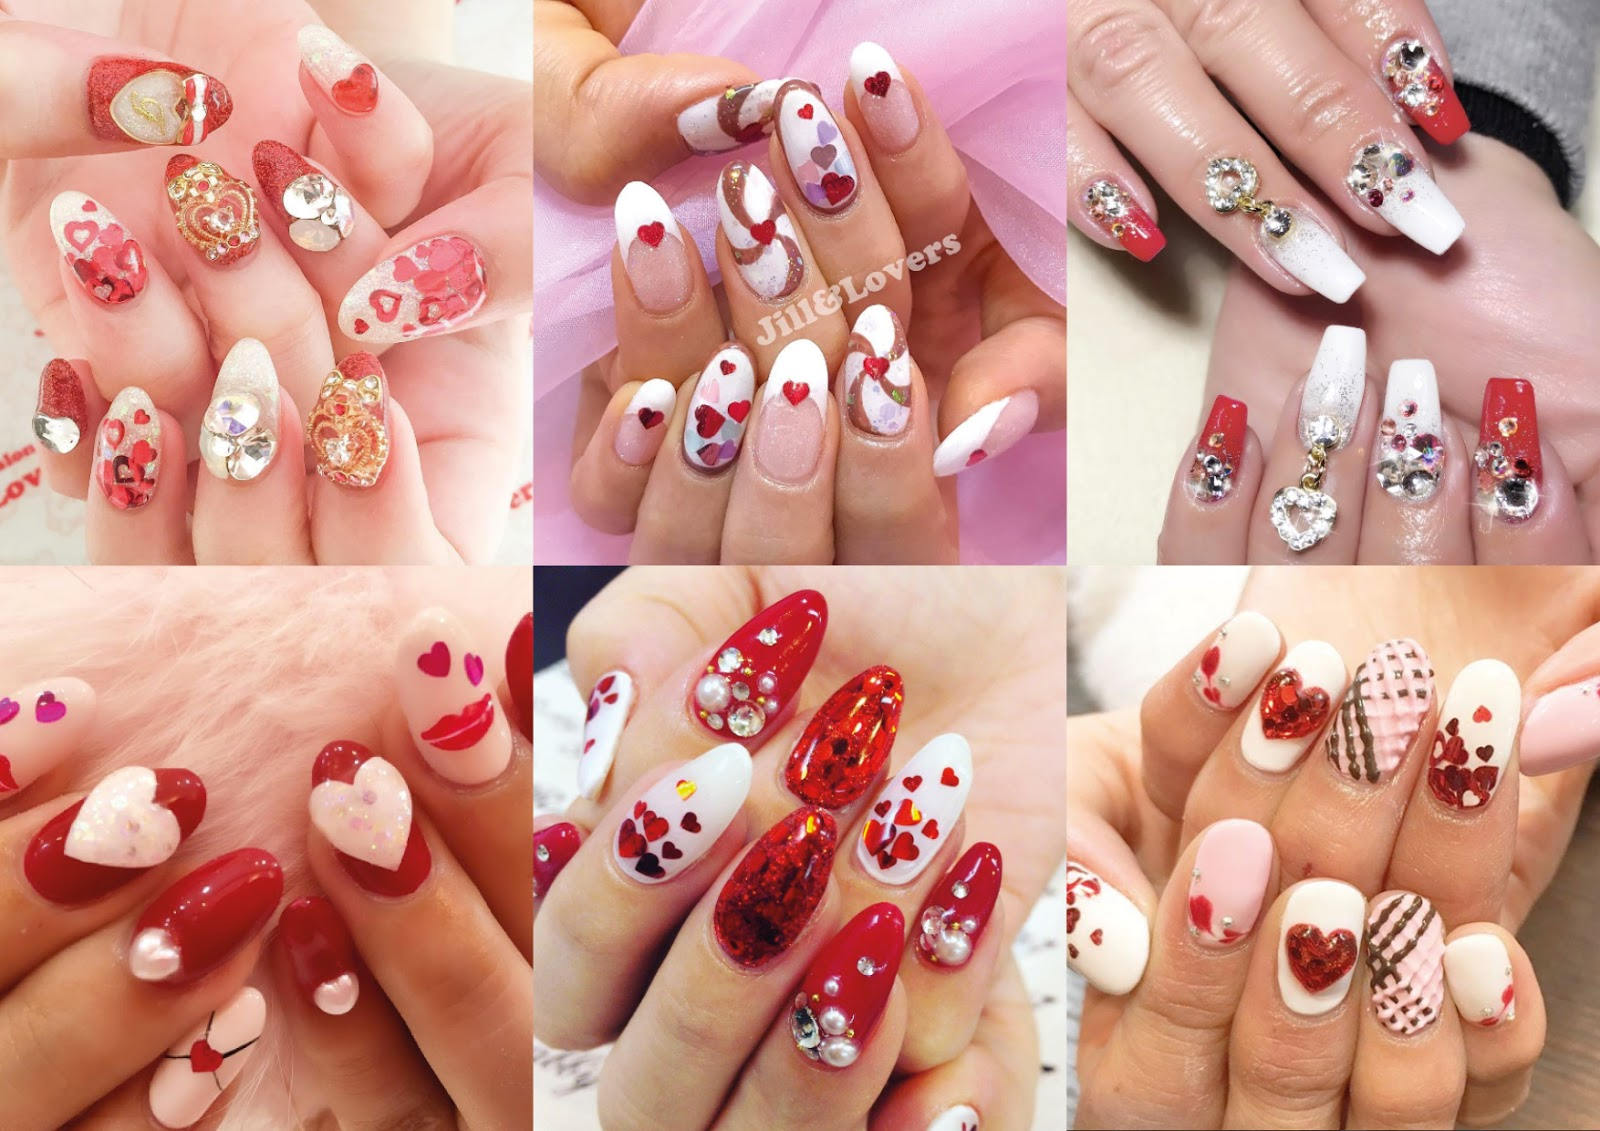 gyaru nails, valentines day nails, inspiration